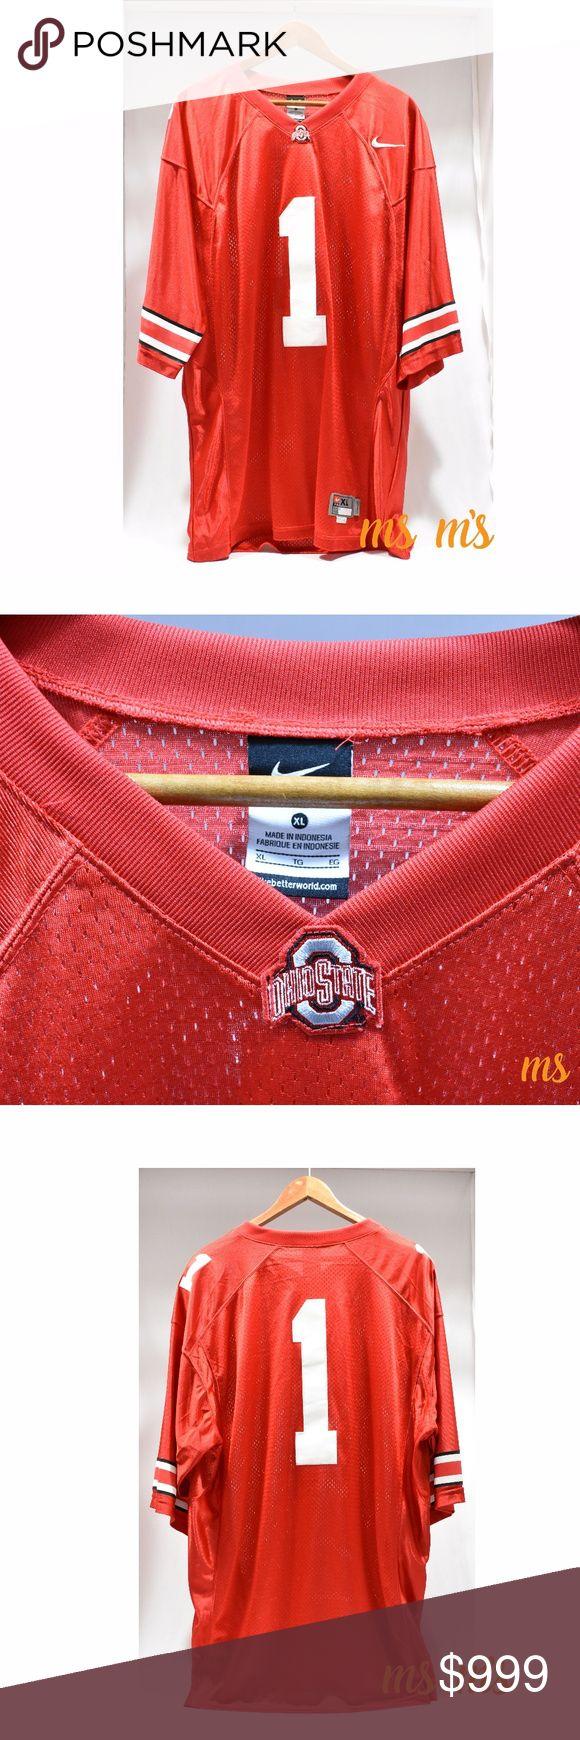 Coming soon Nike mens ohio state football jersey Buckeye  Coming soon Nike mens ohio state football jersey Nike Shirts Tees - Short Sleeve